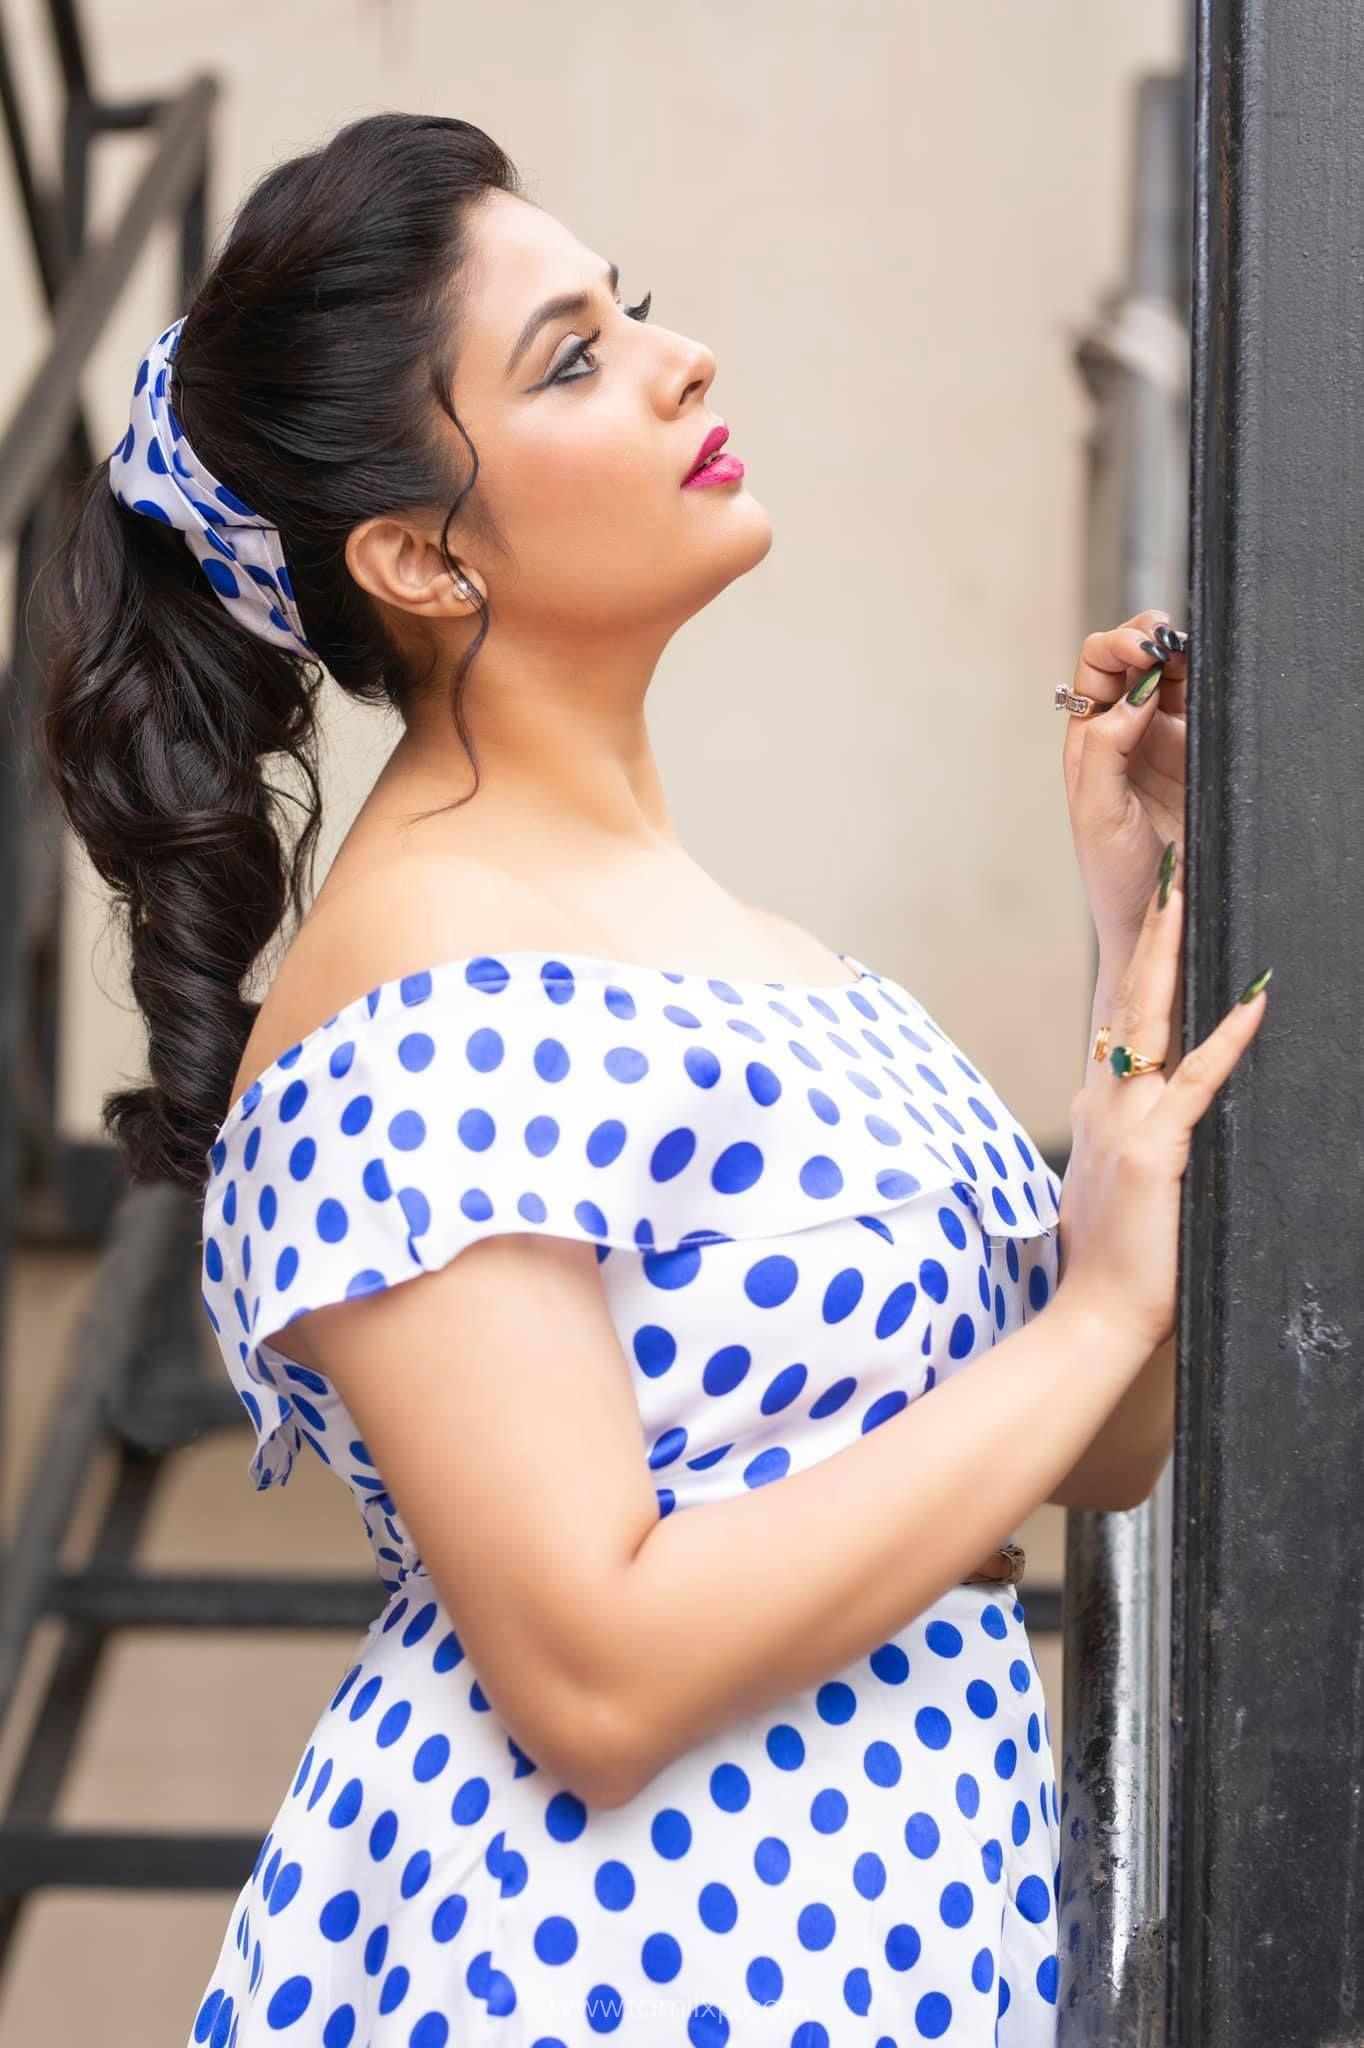 actress srimukhi images